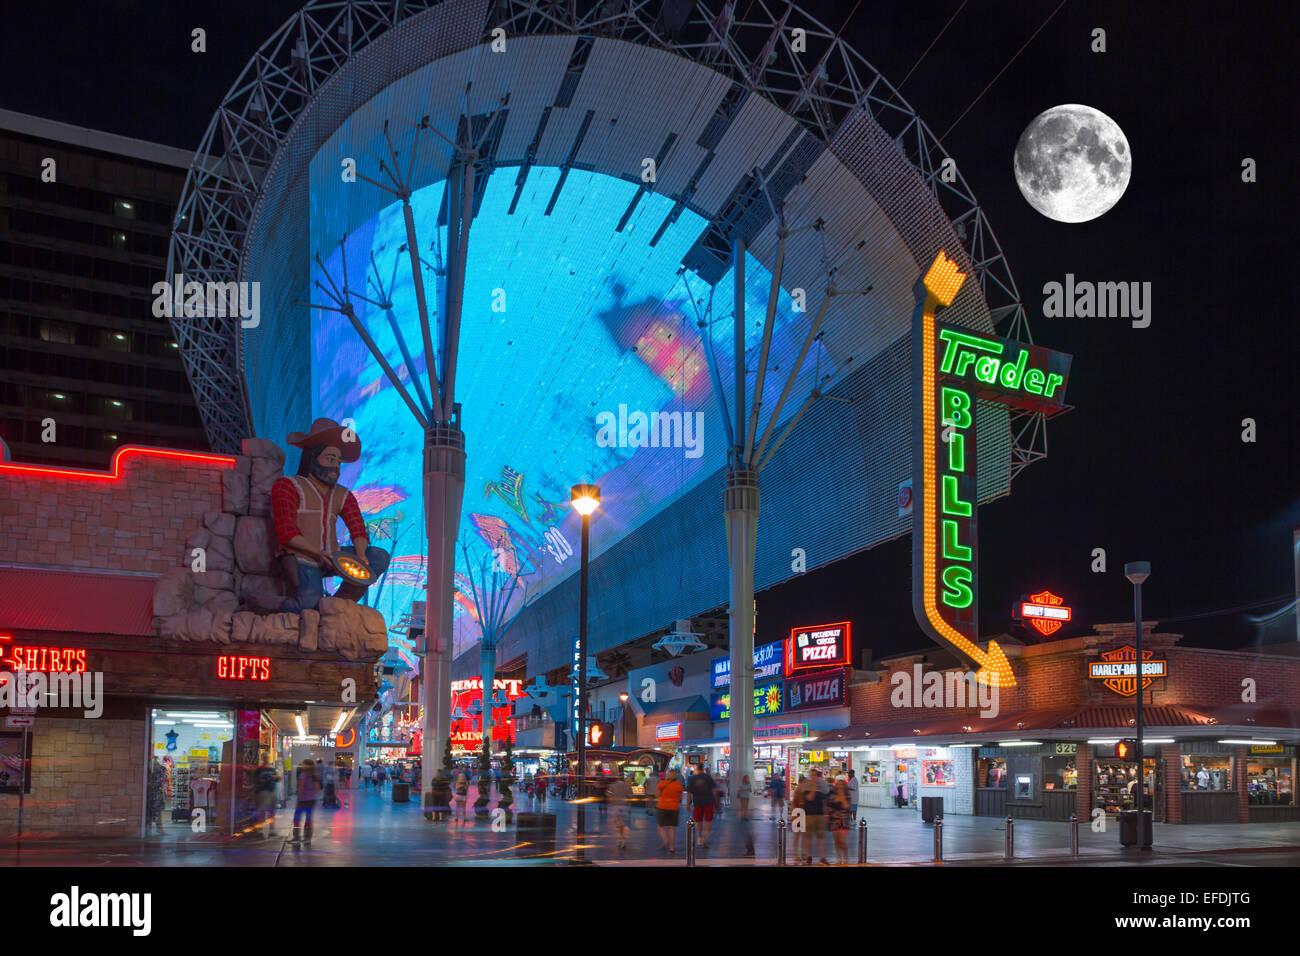 Fremont Street Stock Photos & Fremont Street Stock Images - Alamy